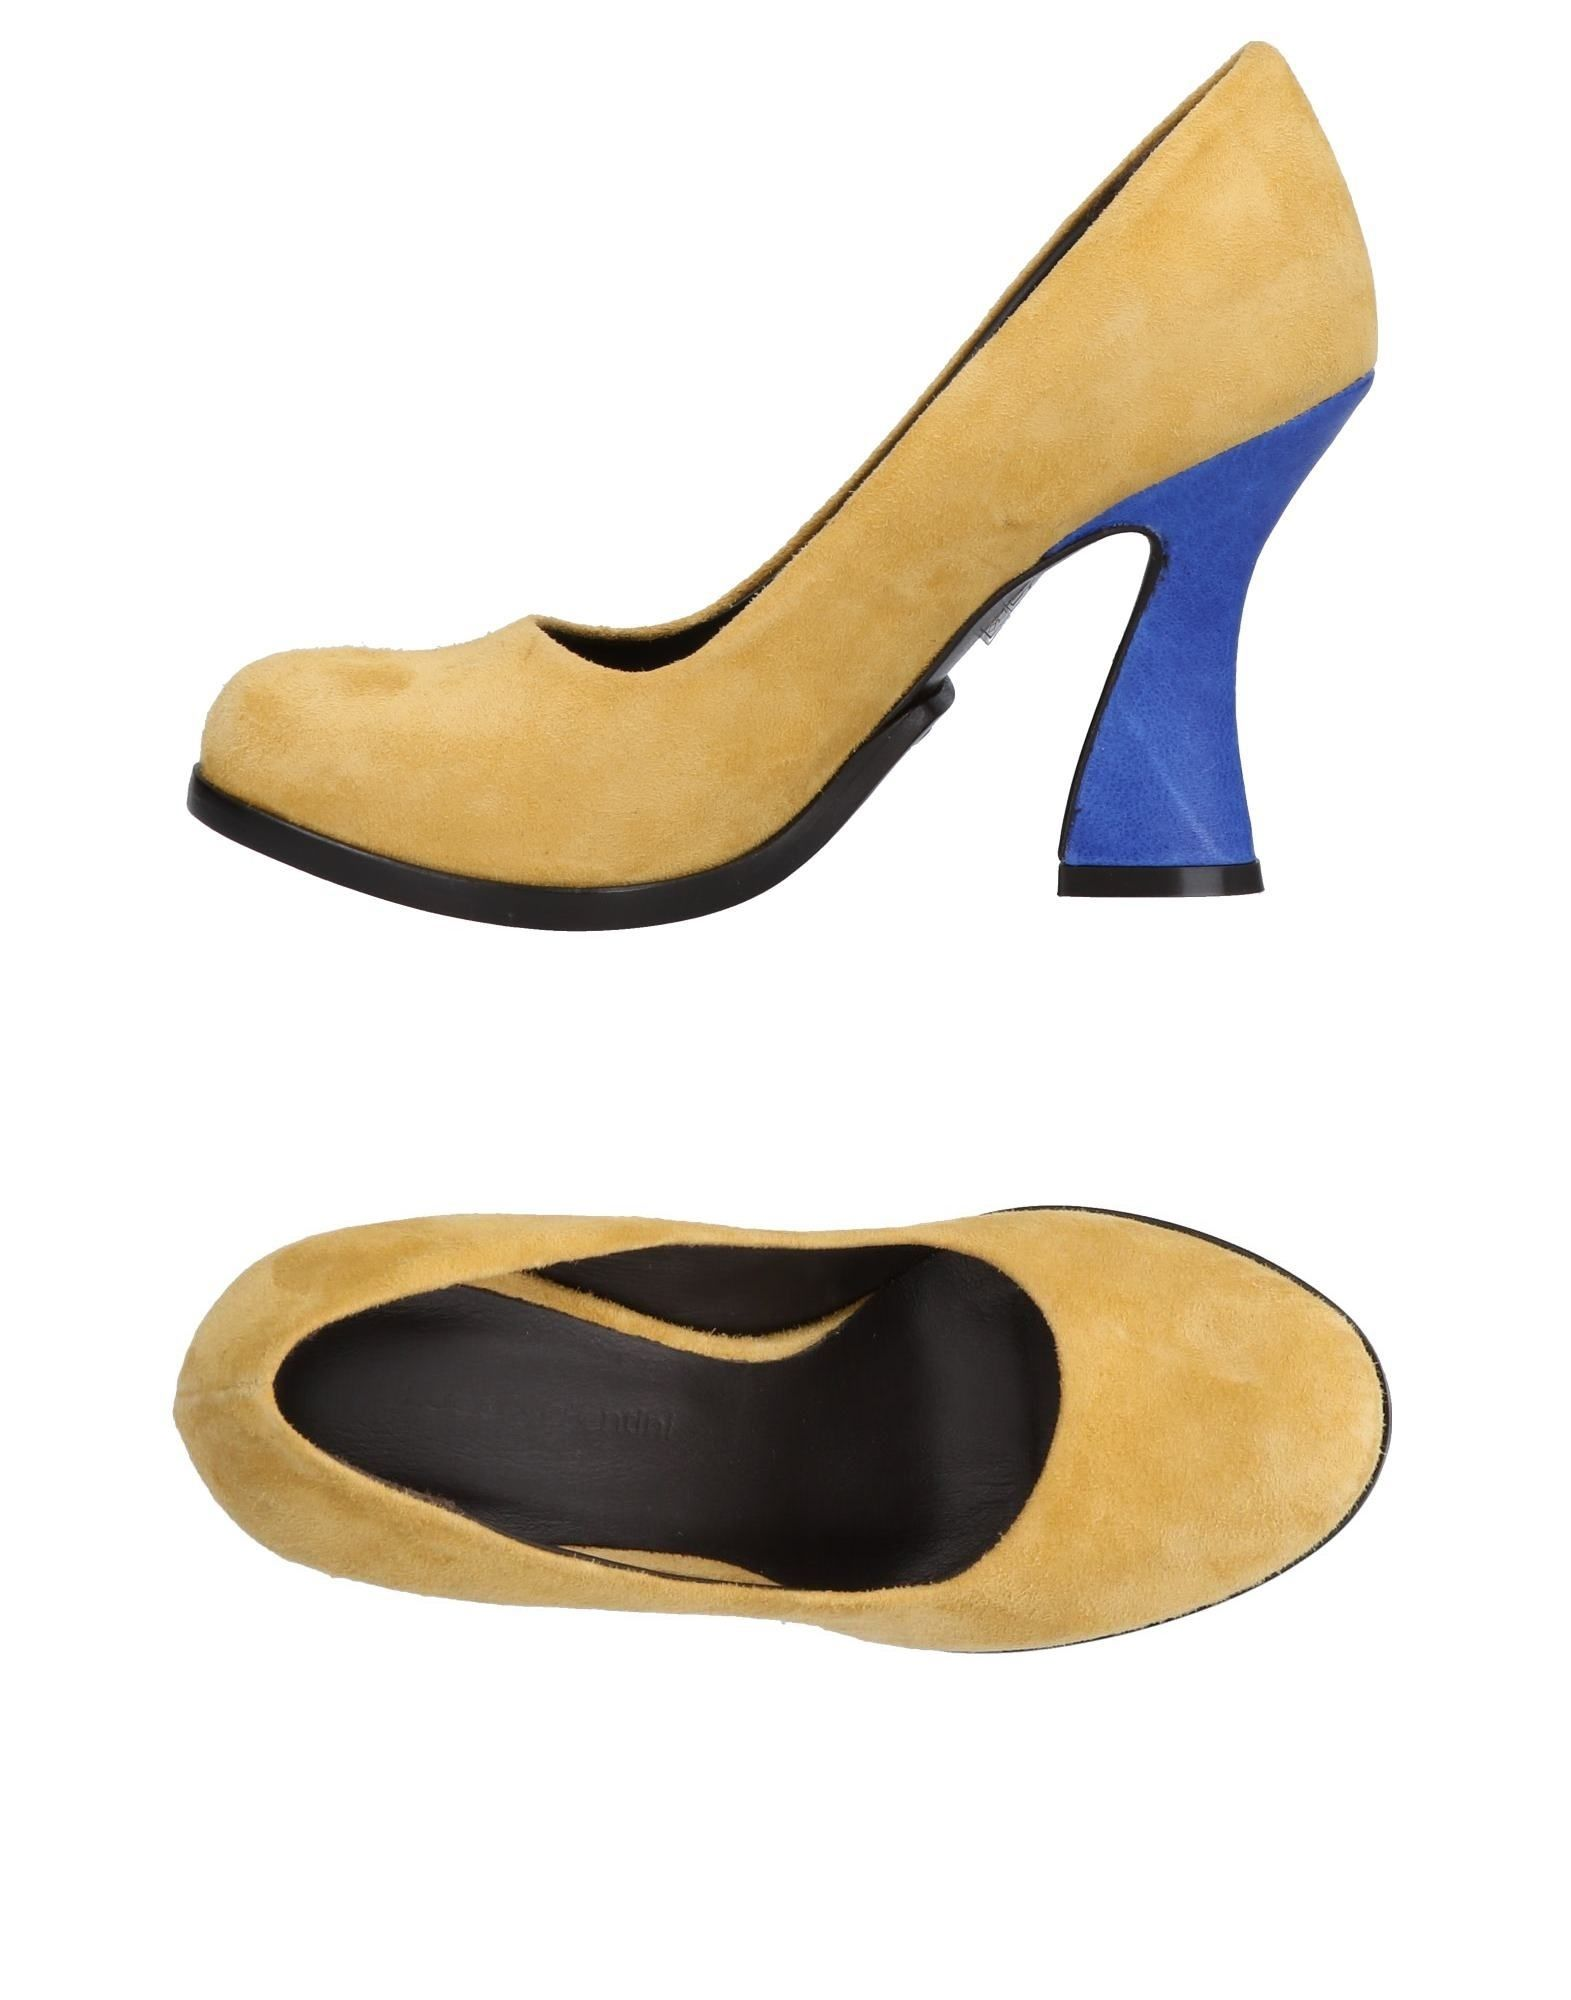 Luca Valentini Pumps Pumps Pumps Damen  11489474SE Gute Qualität beliebte Schuhe a11cd5